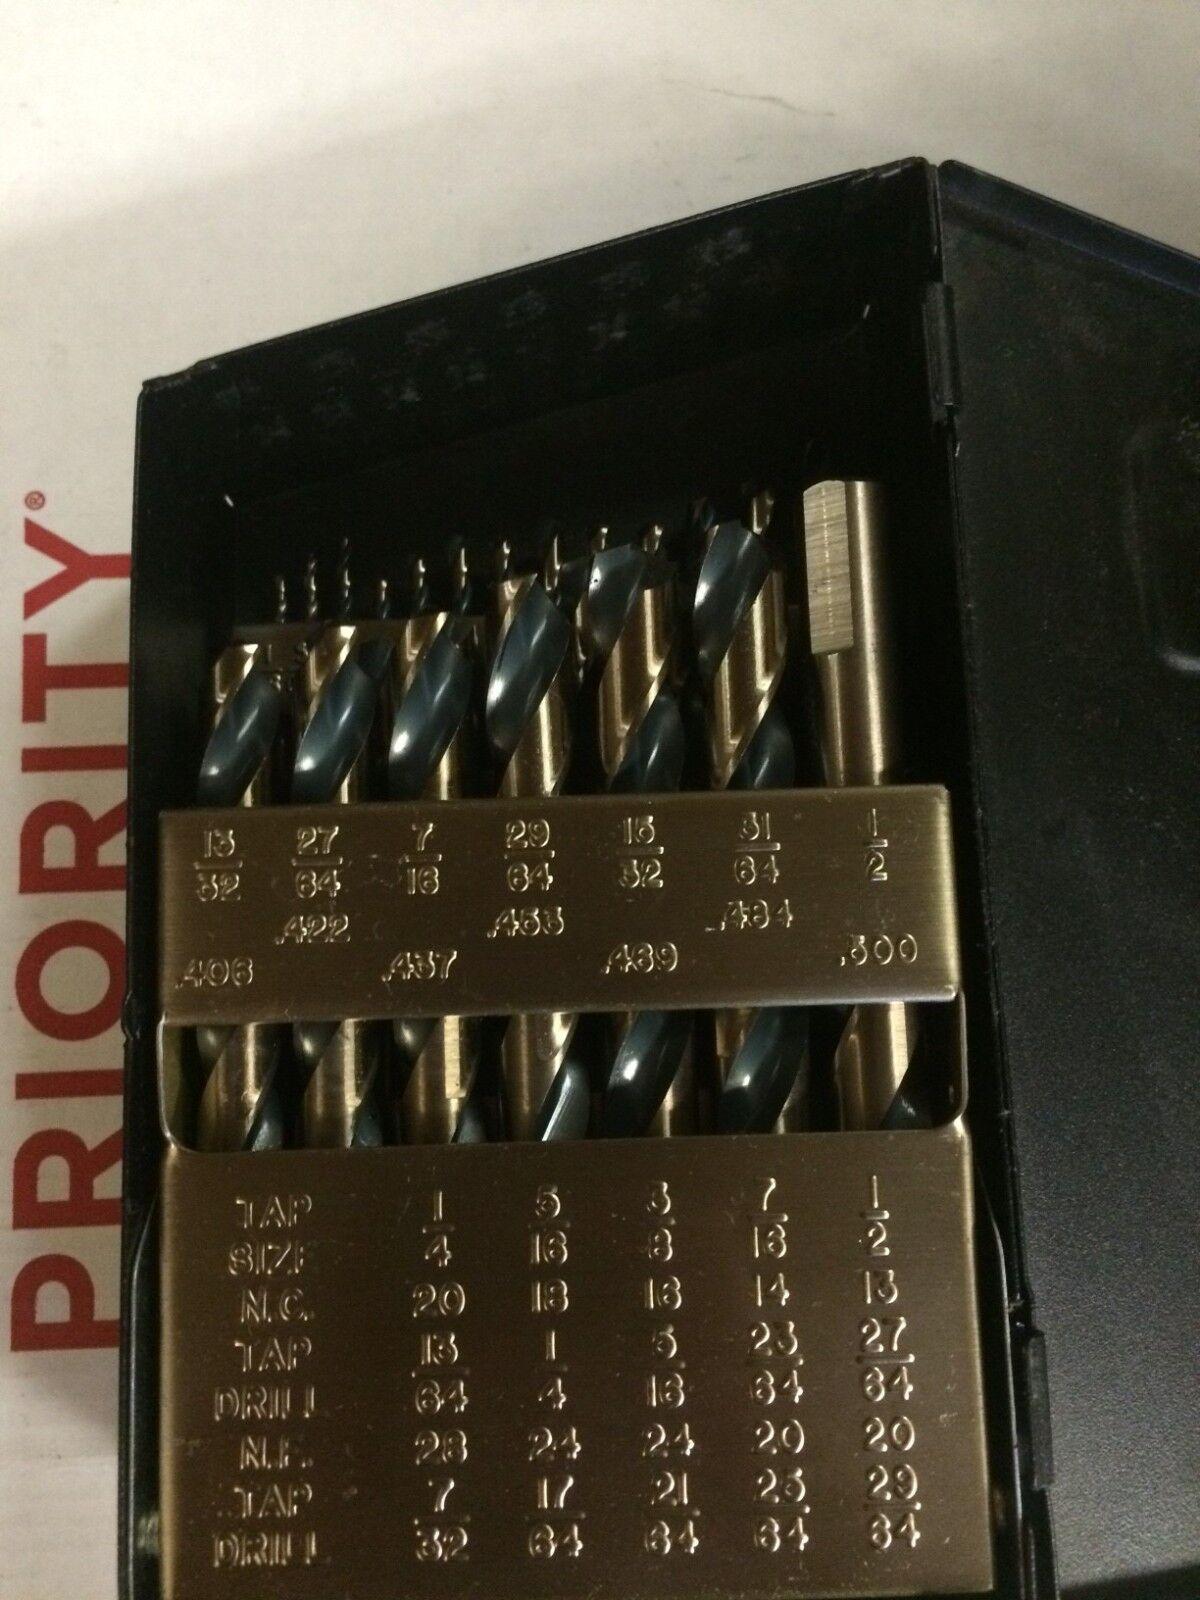 Norseman 29pc Hi-Molybdenum M7 Drill Bit Set W Index 1//16-1//2 made in USA SPM-29